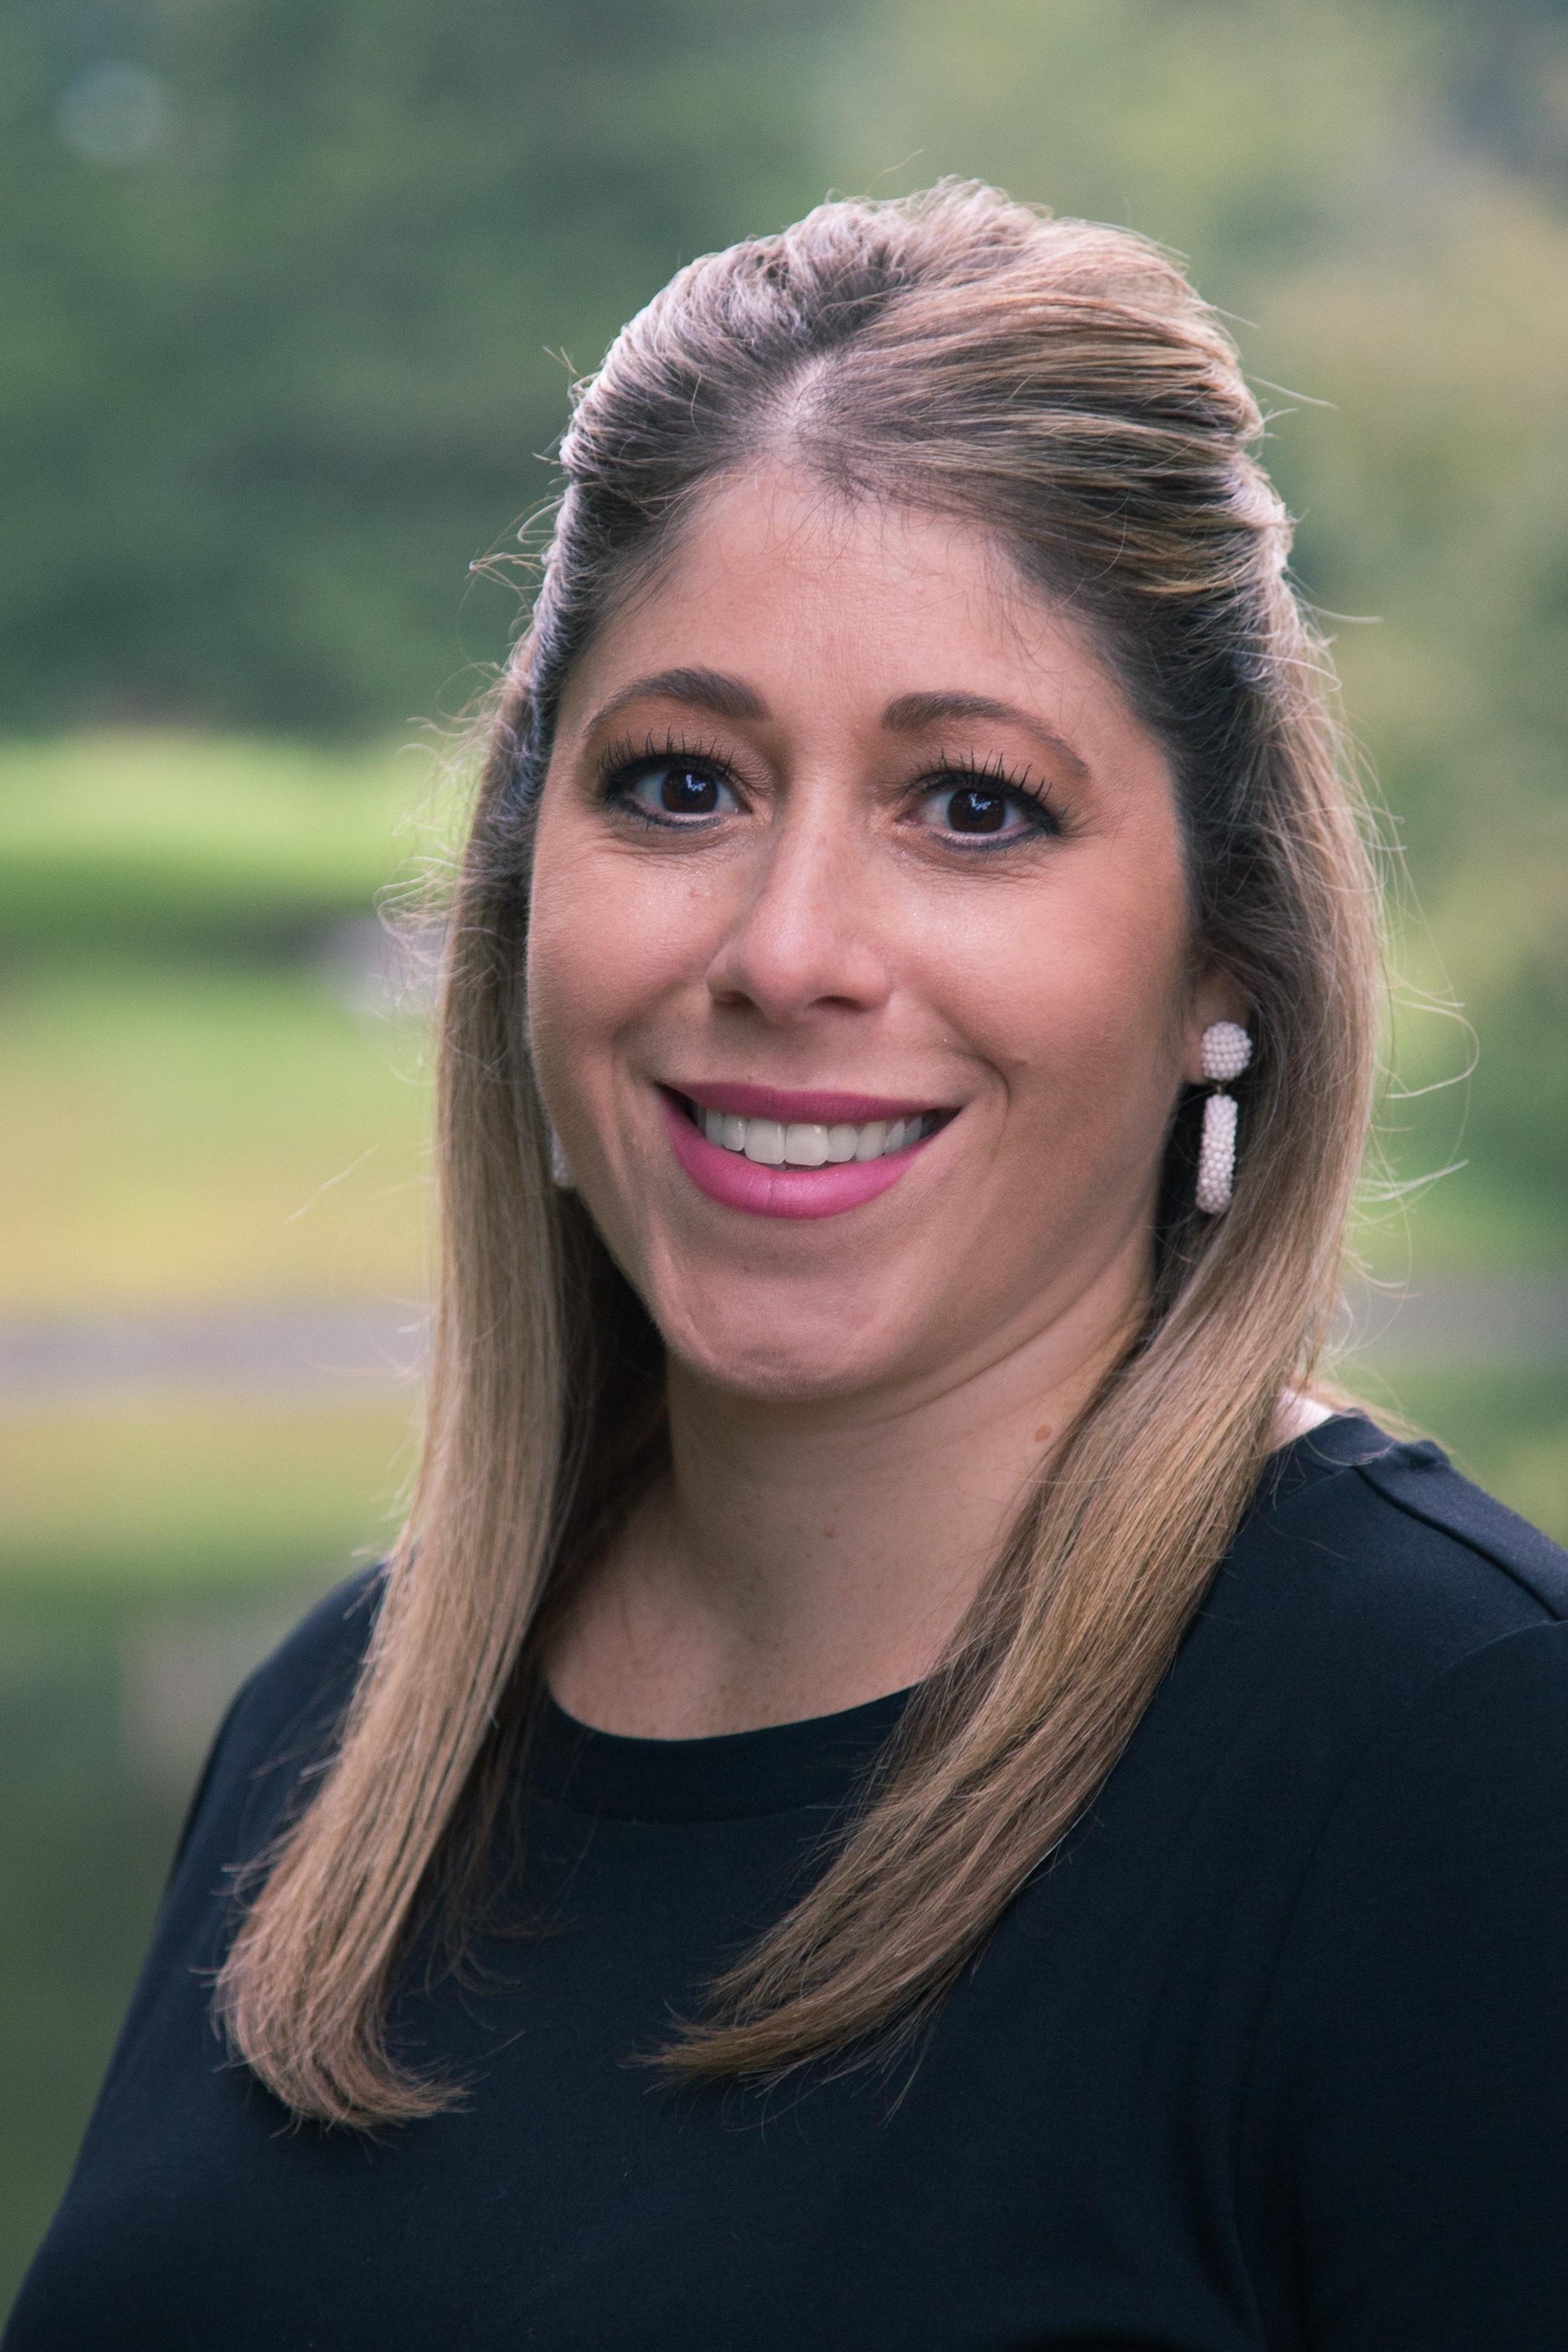 CHCH Lisa Pelrine Profile Photo